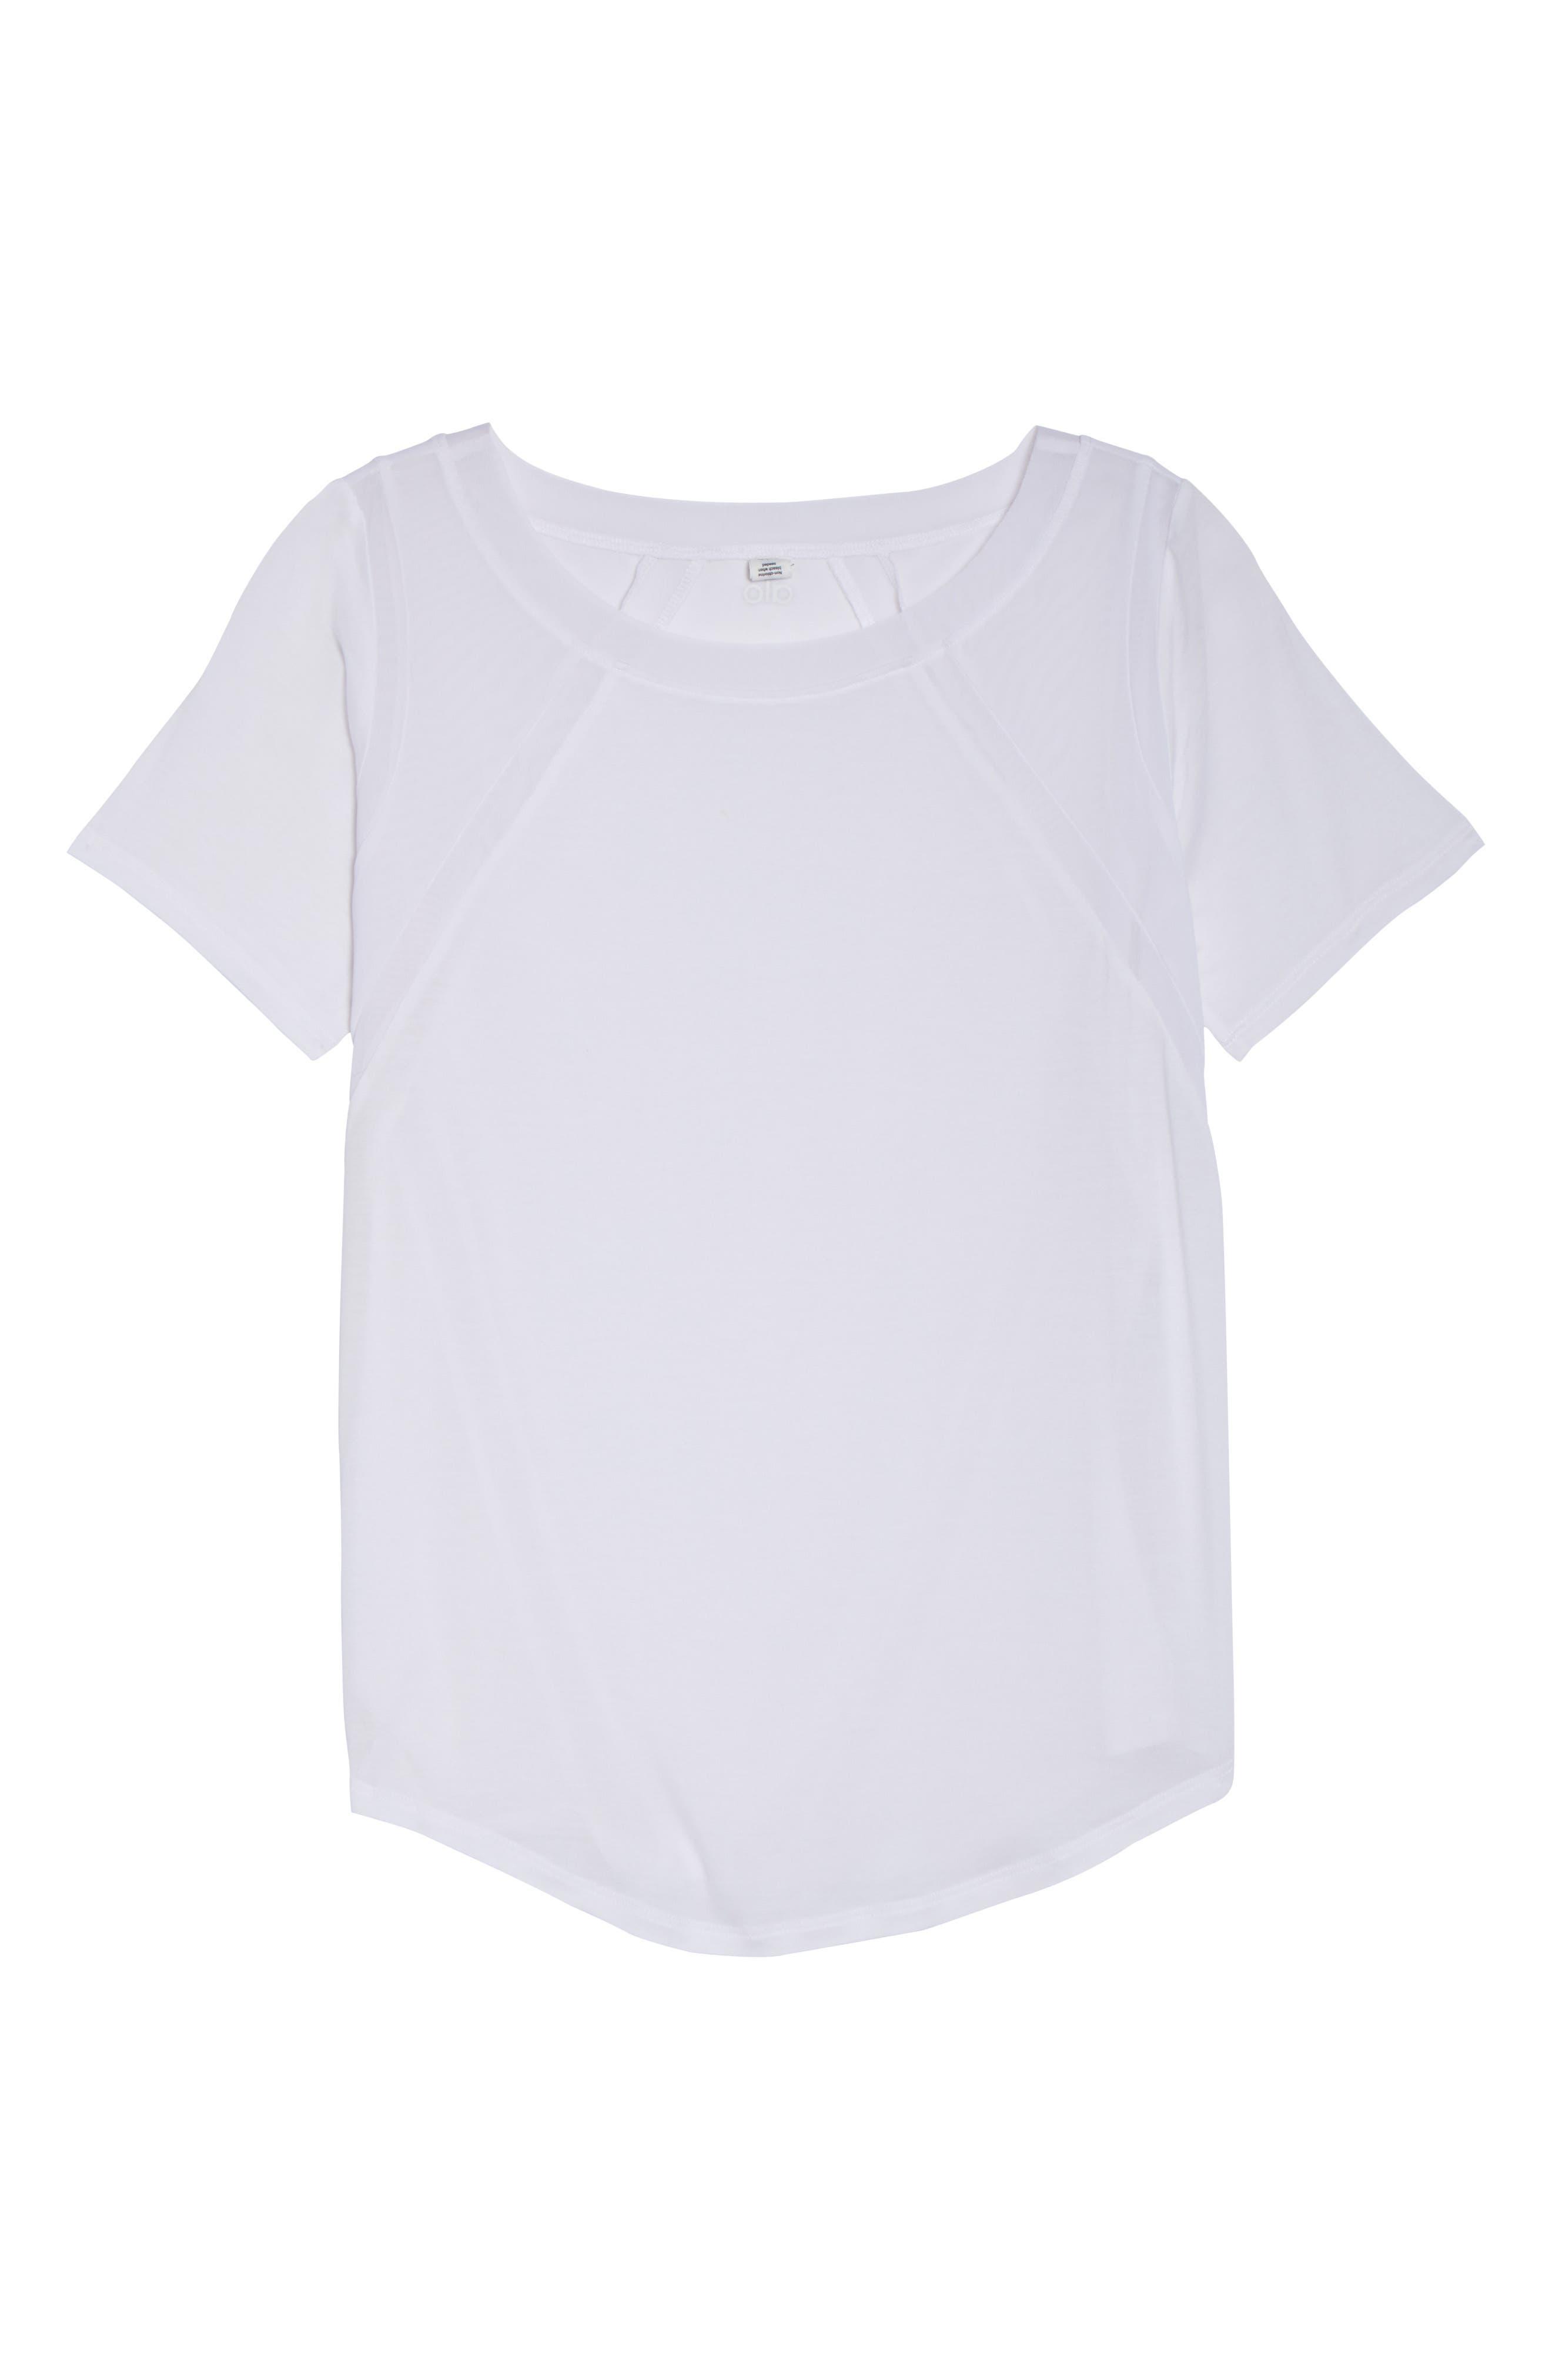 Tone Short Sleeve Tee,                             Alternate thumbnail 7, color,                             White